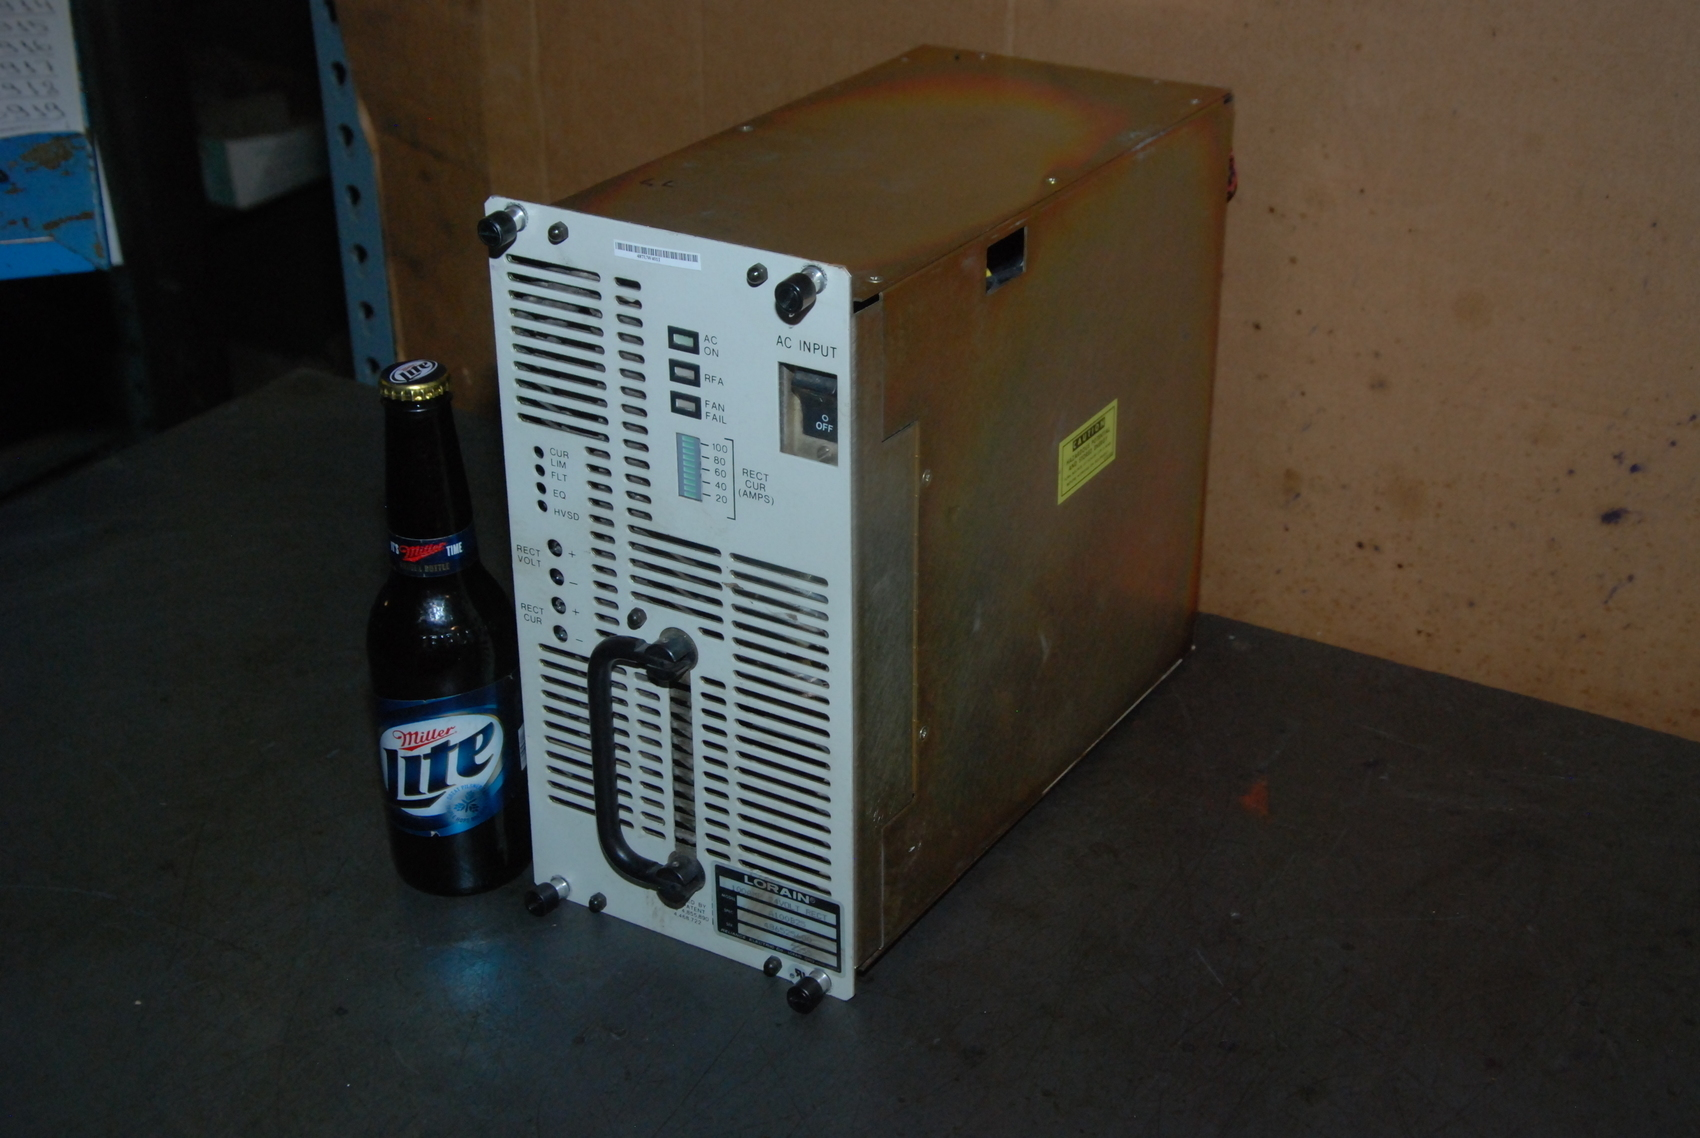 Lorain 100 Amp 24 Volt Rectifier Model A100B25 Spec 486525600